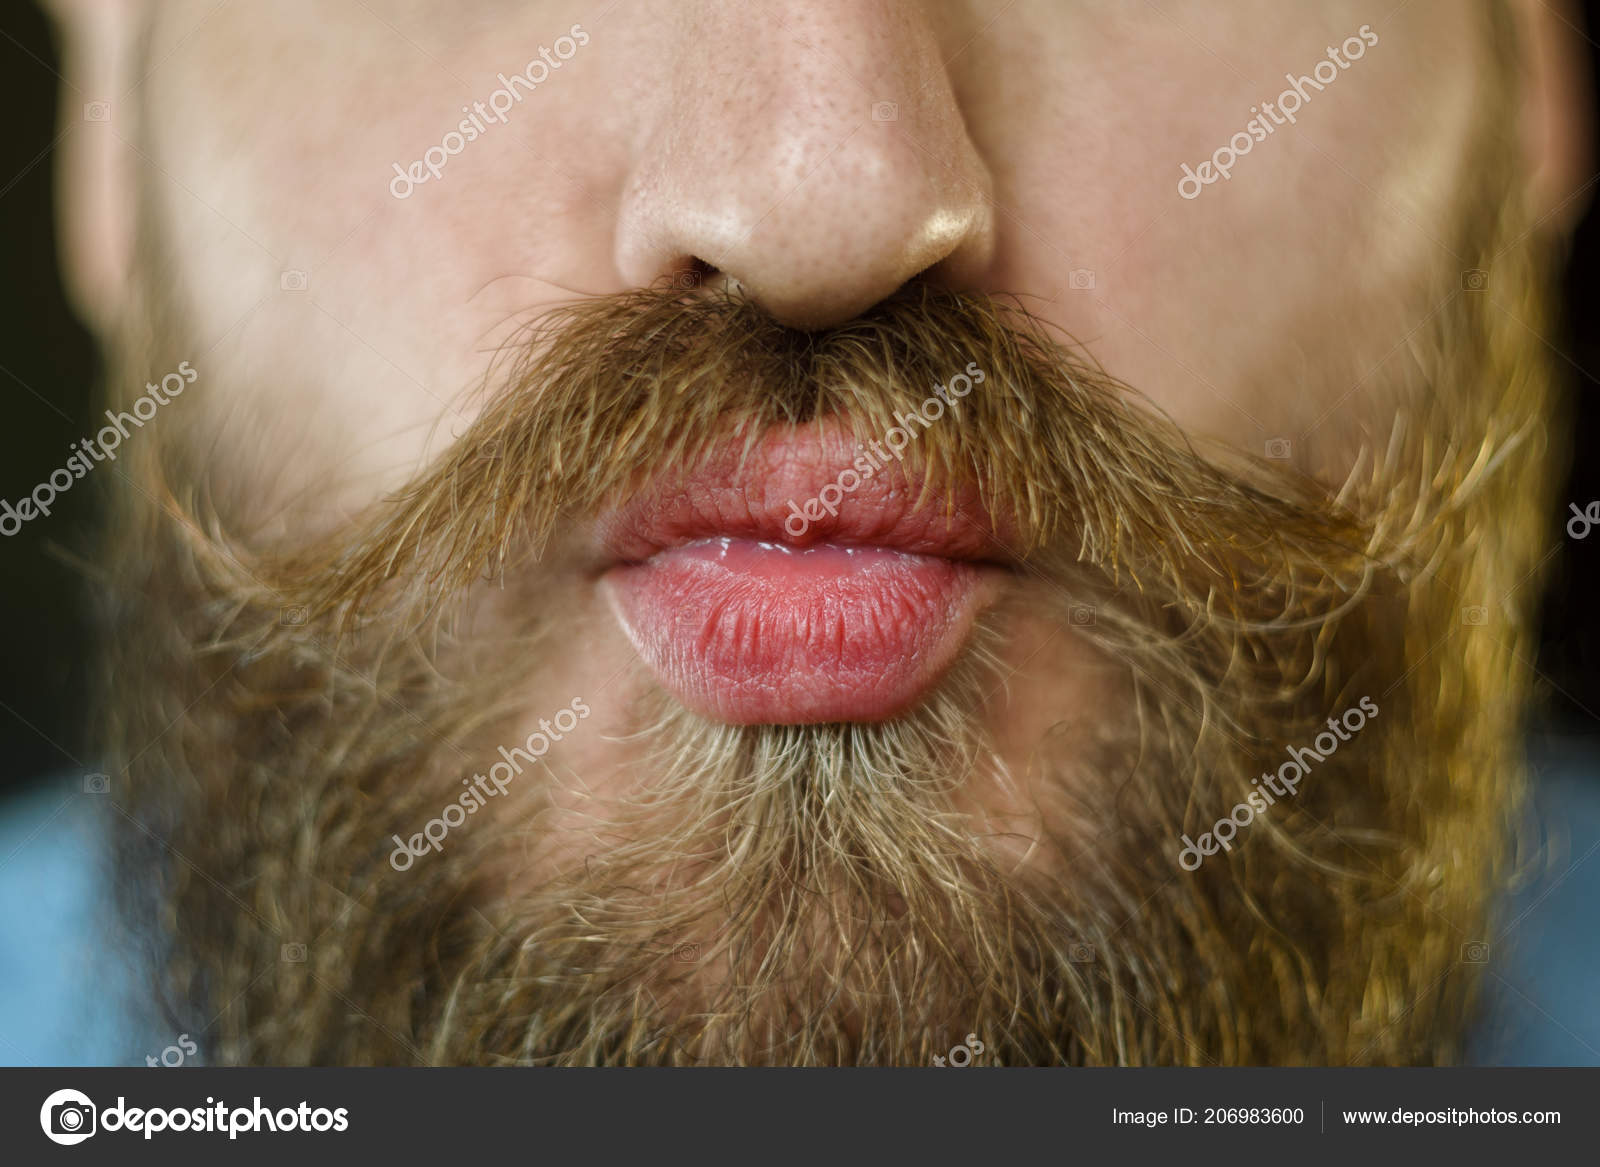 man lips kiss